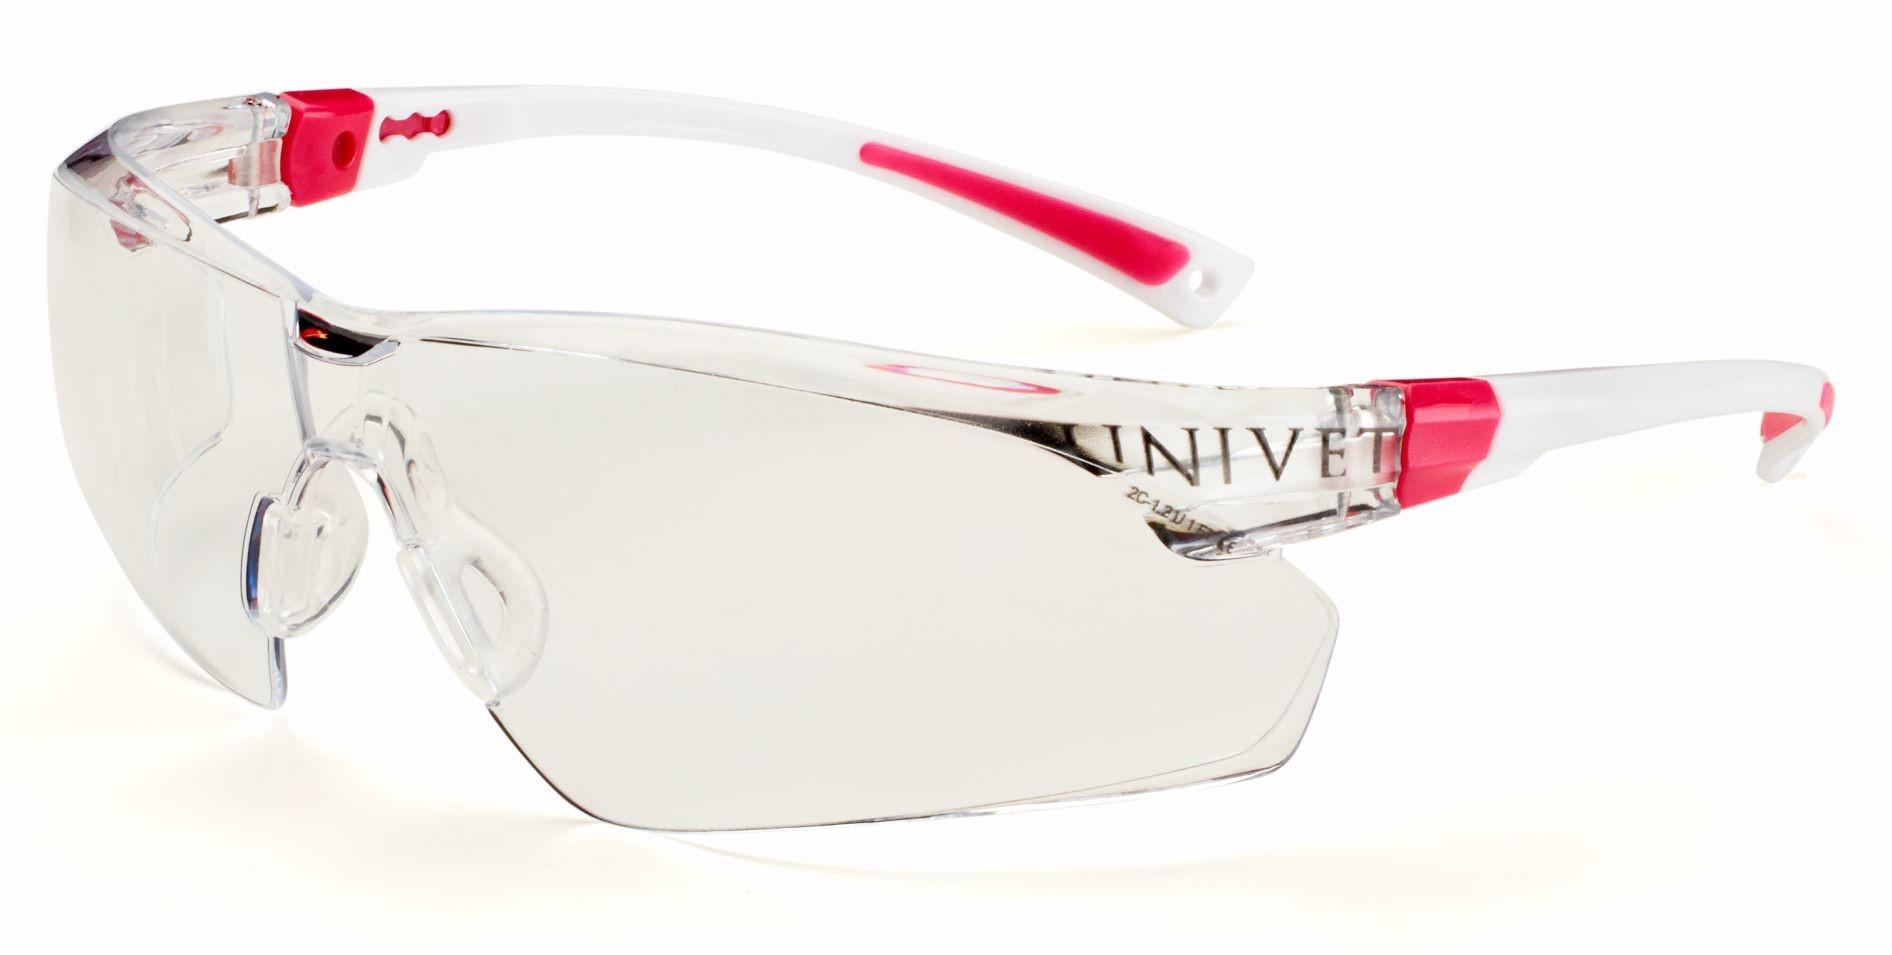 Voorbeeld spatbril met juiste CE-marketing